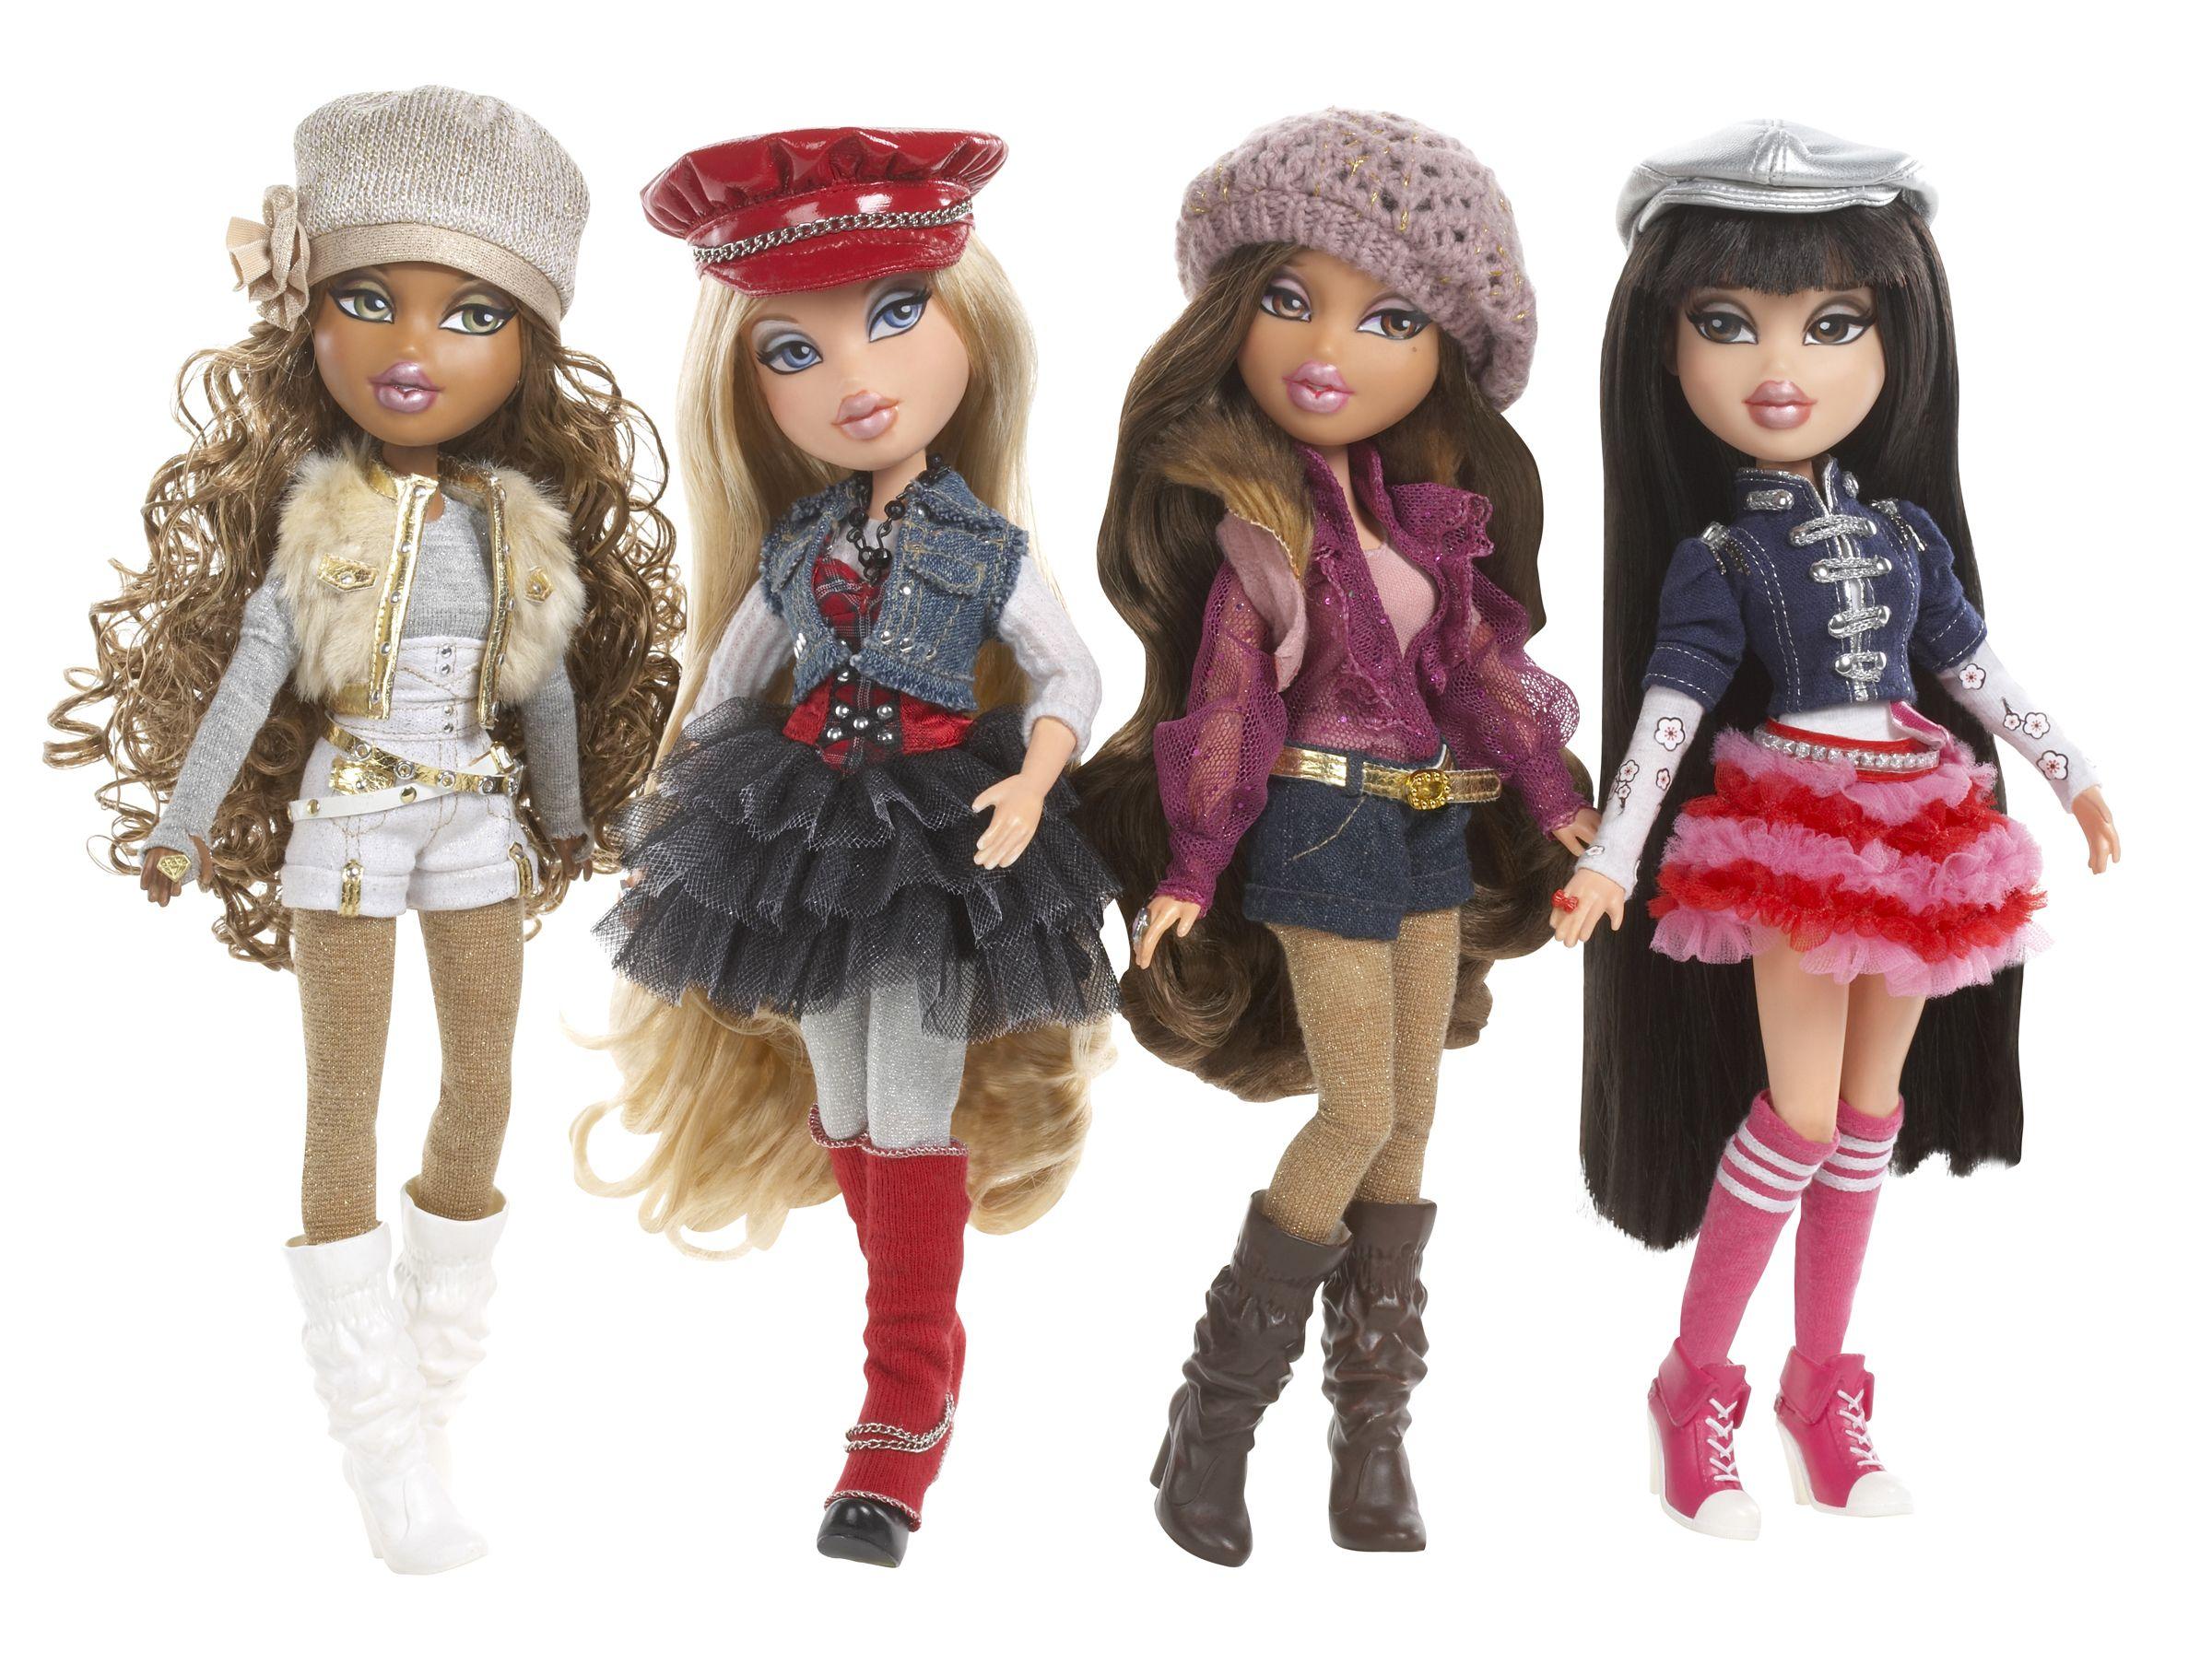 Cute hairstyles for barbie dolls - Bratz 10th Anniversary Dolls 2010